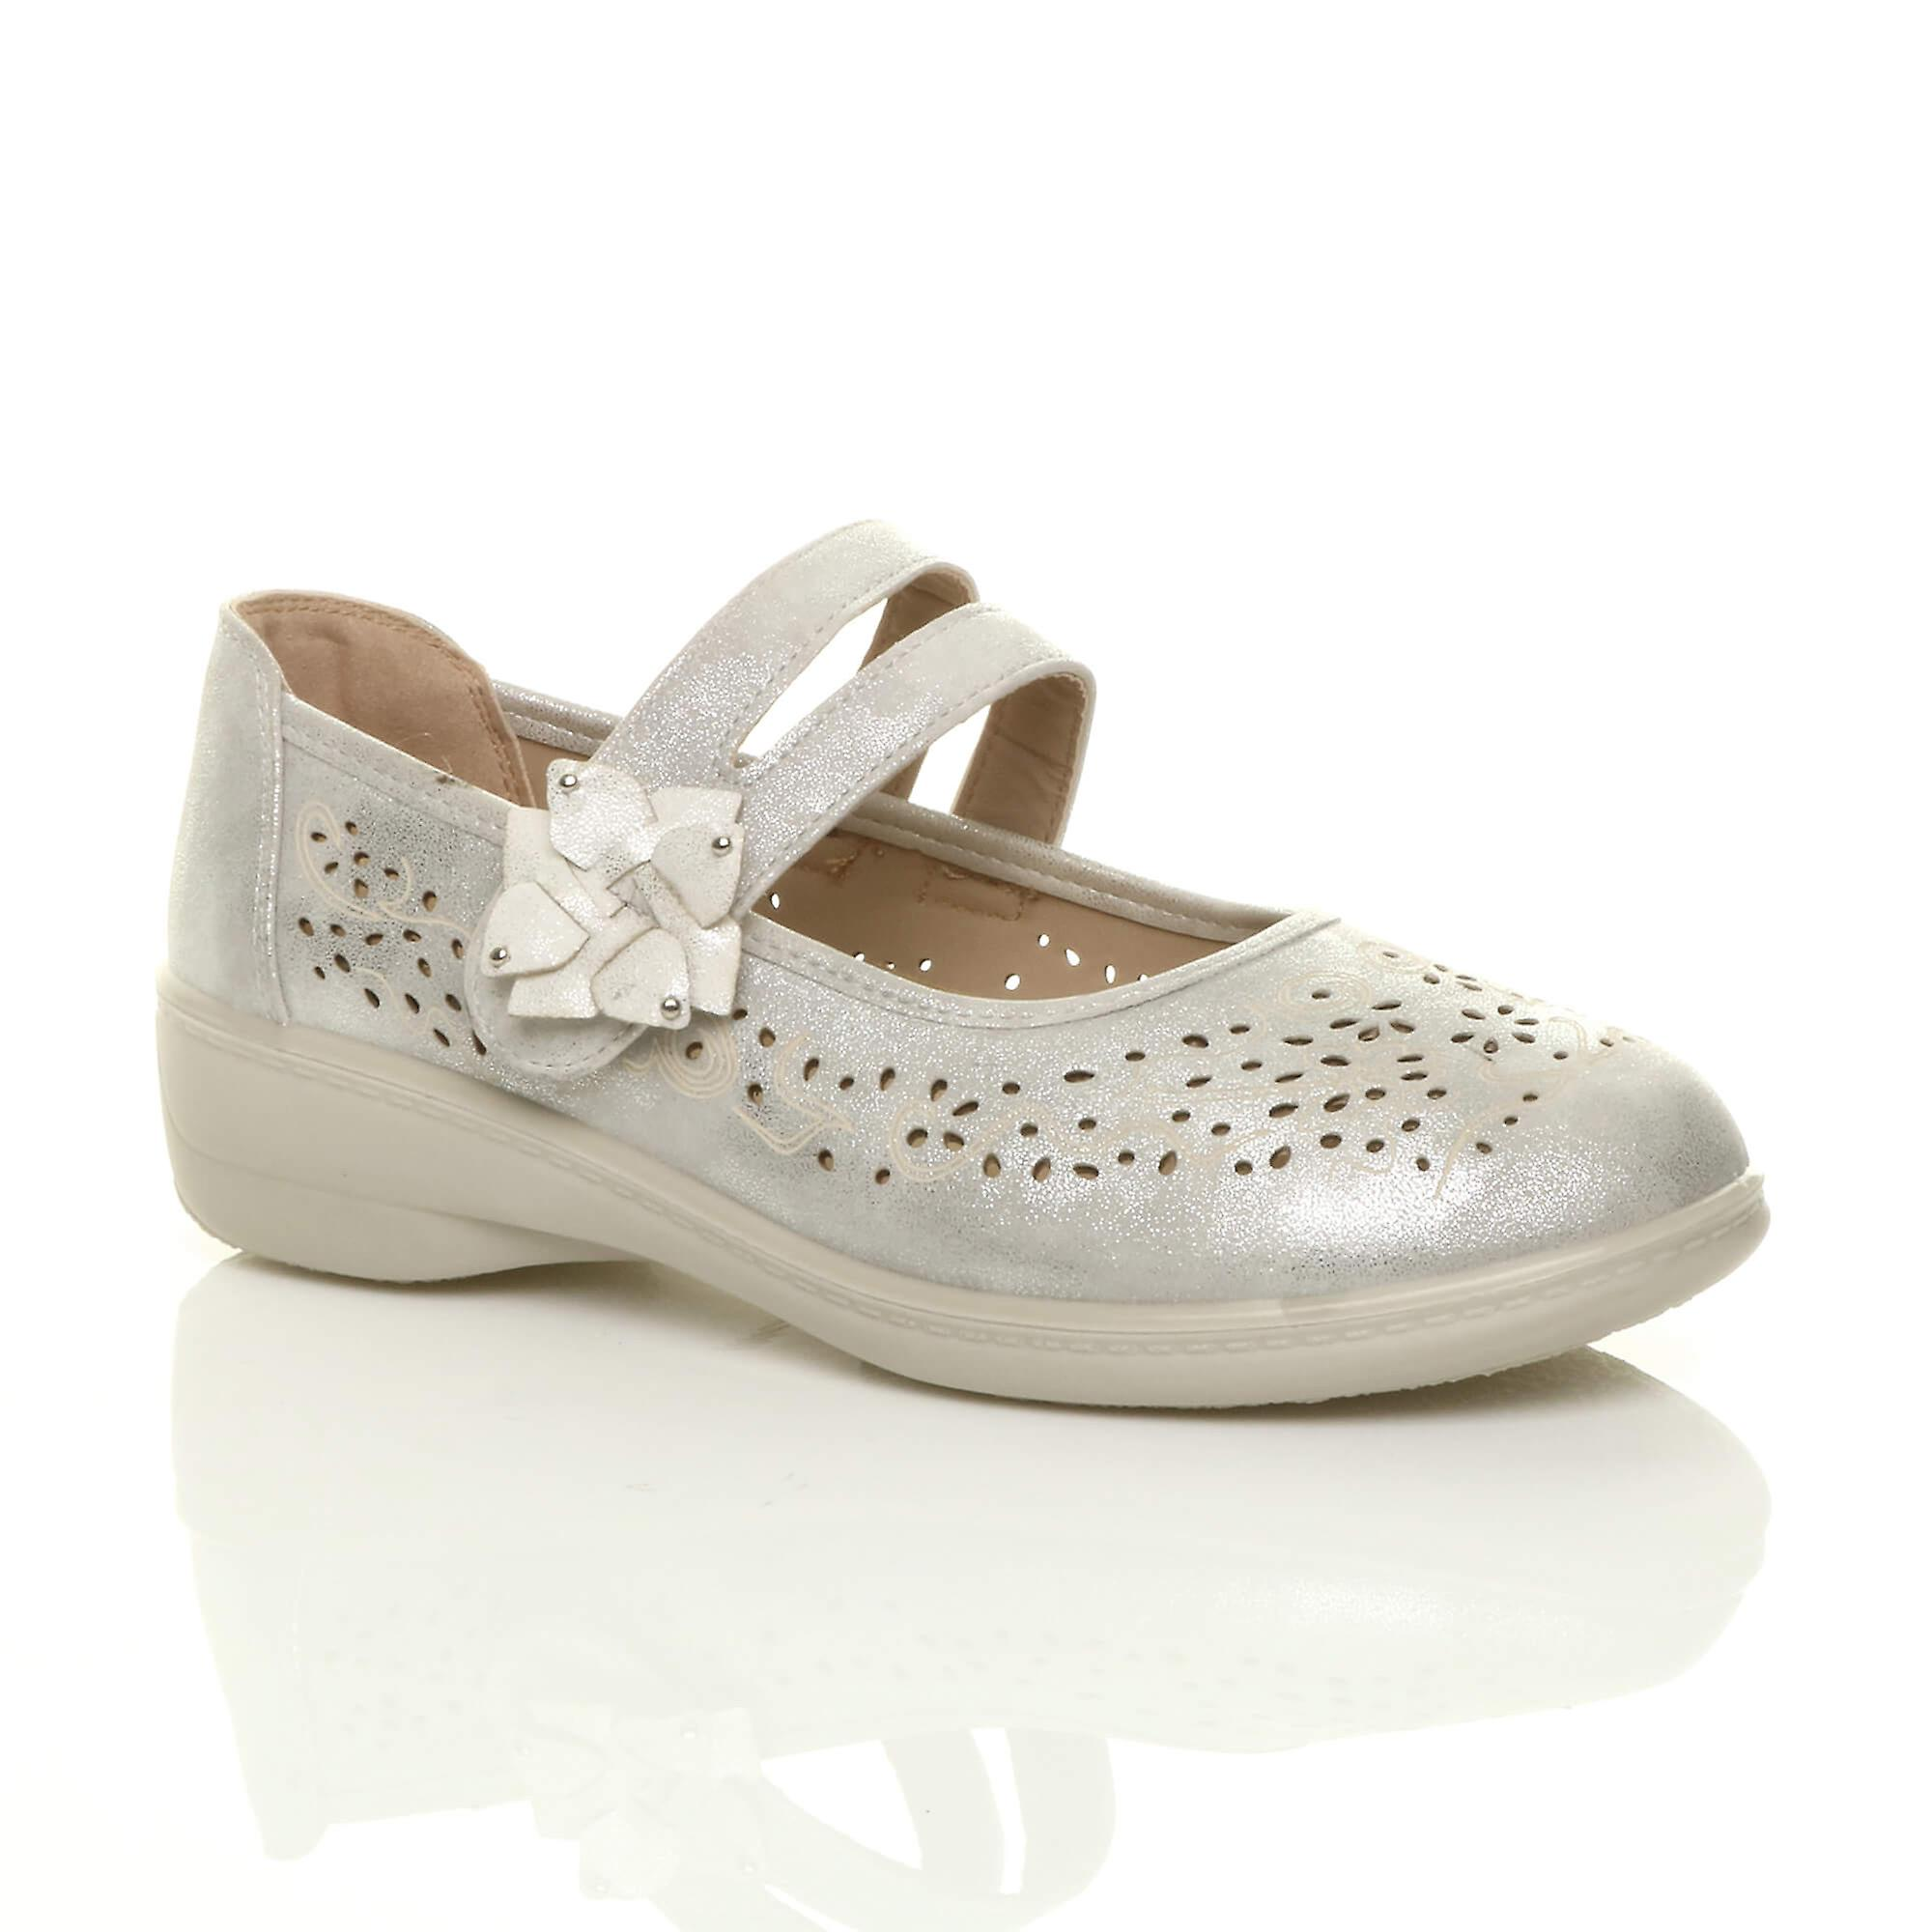 Ajvani womens flat grip sole padded cushioned mary jane hook & loop comfort shoes MXYwF